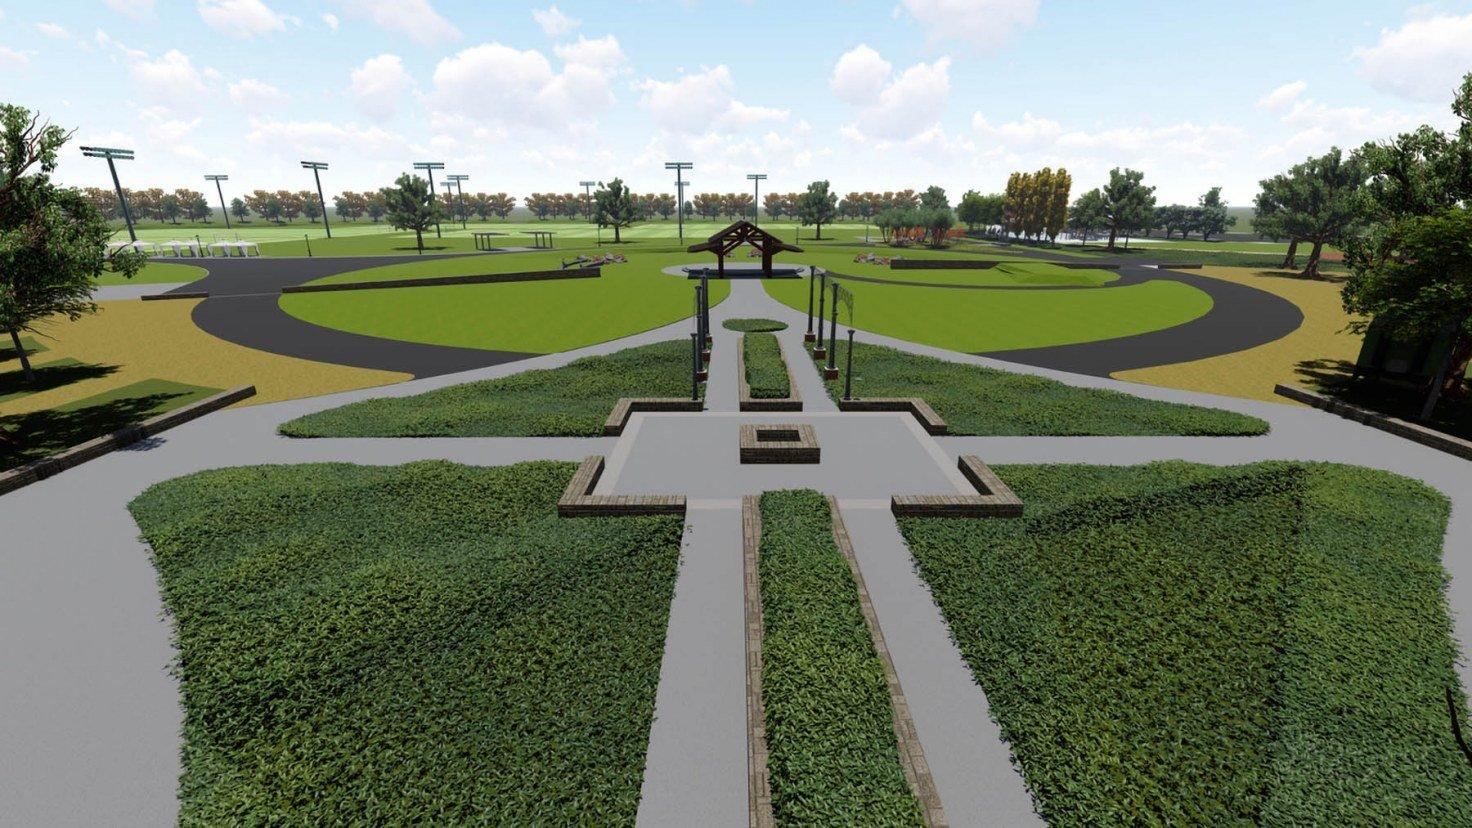 Limoneira-Sports-Park